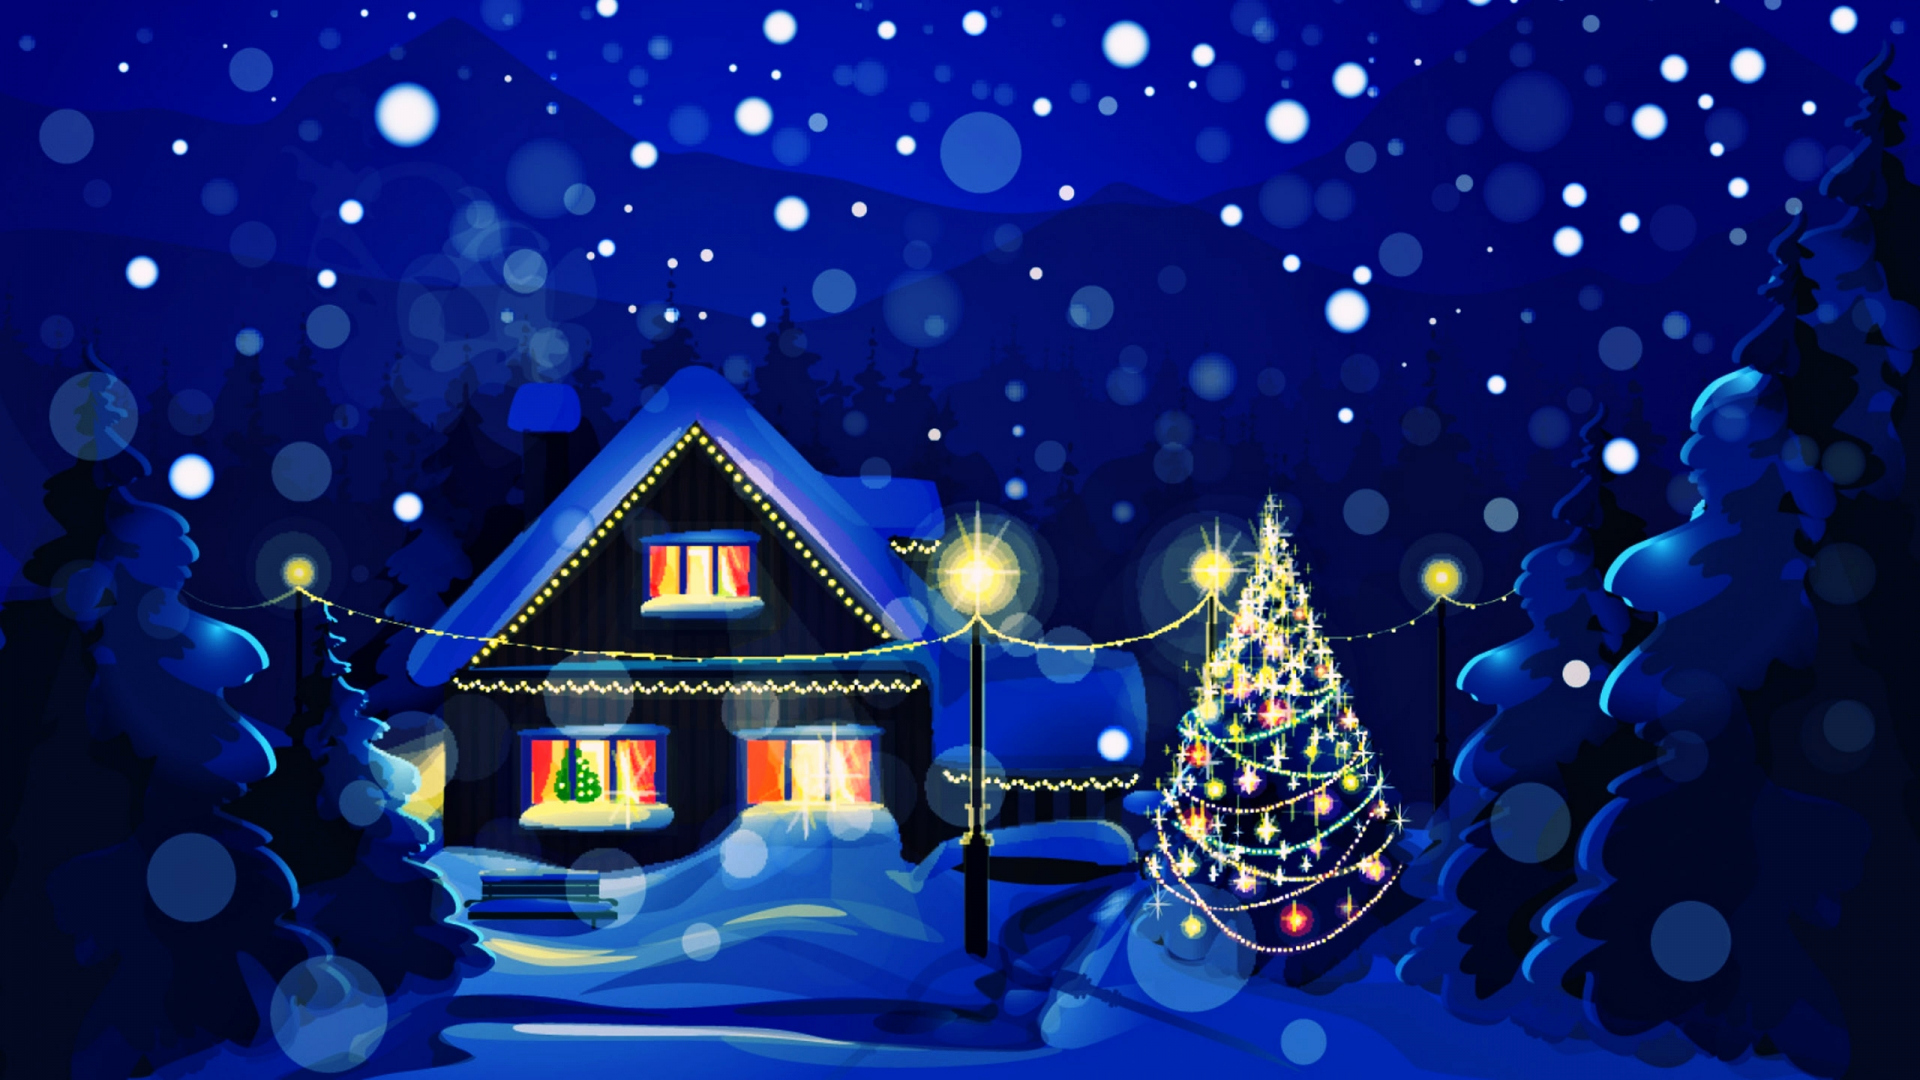 Free Christmas Desktop Wallpaper Awesome Free Hd Christmas Wallpapers Desktop Backgrounds 2016